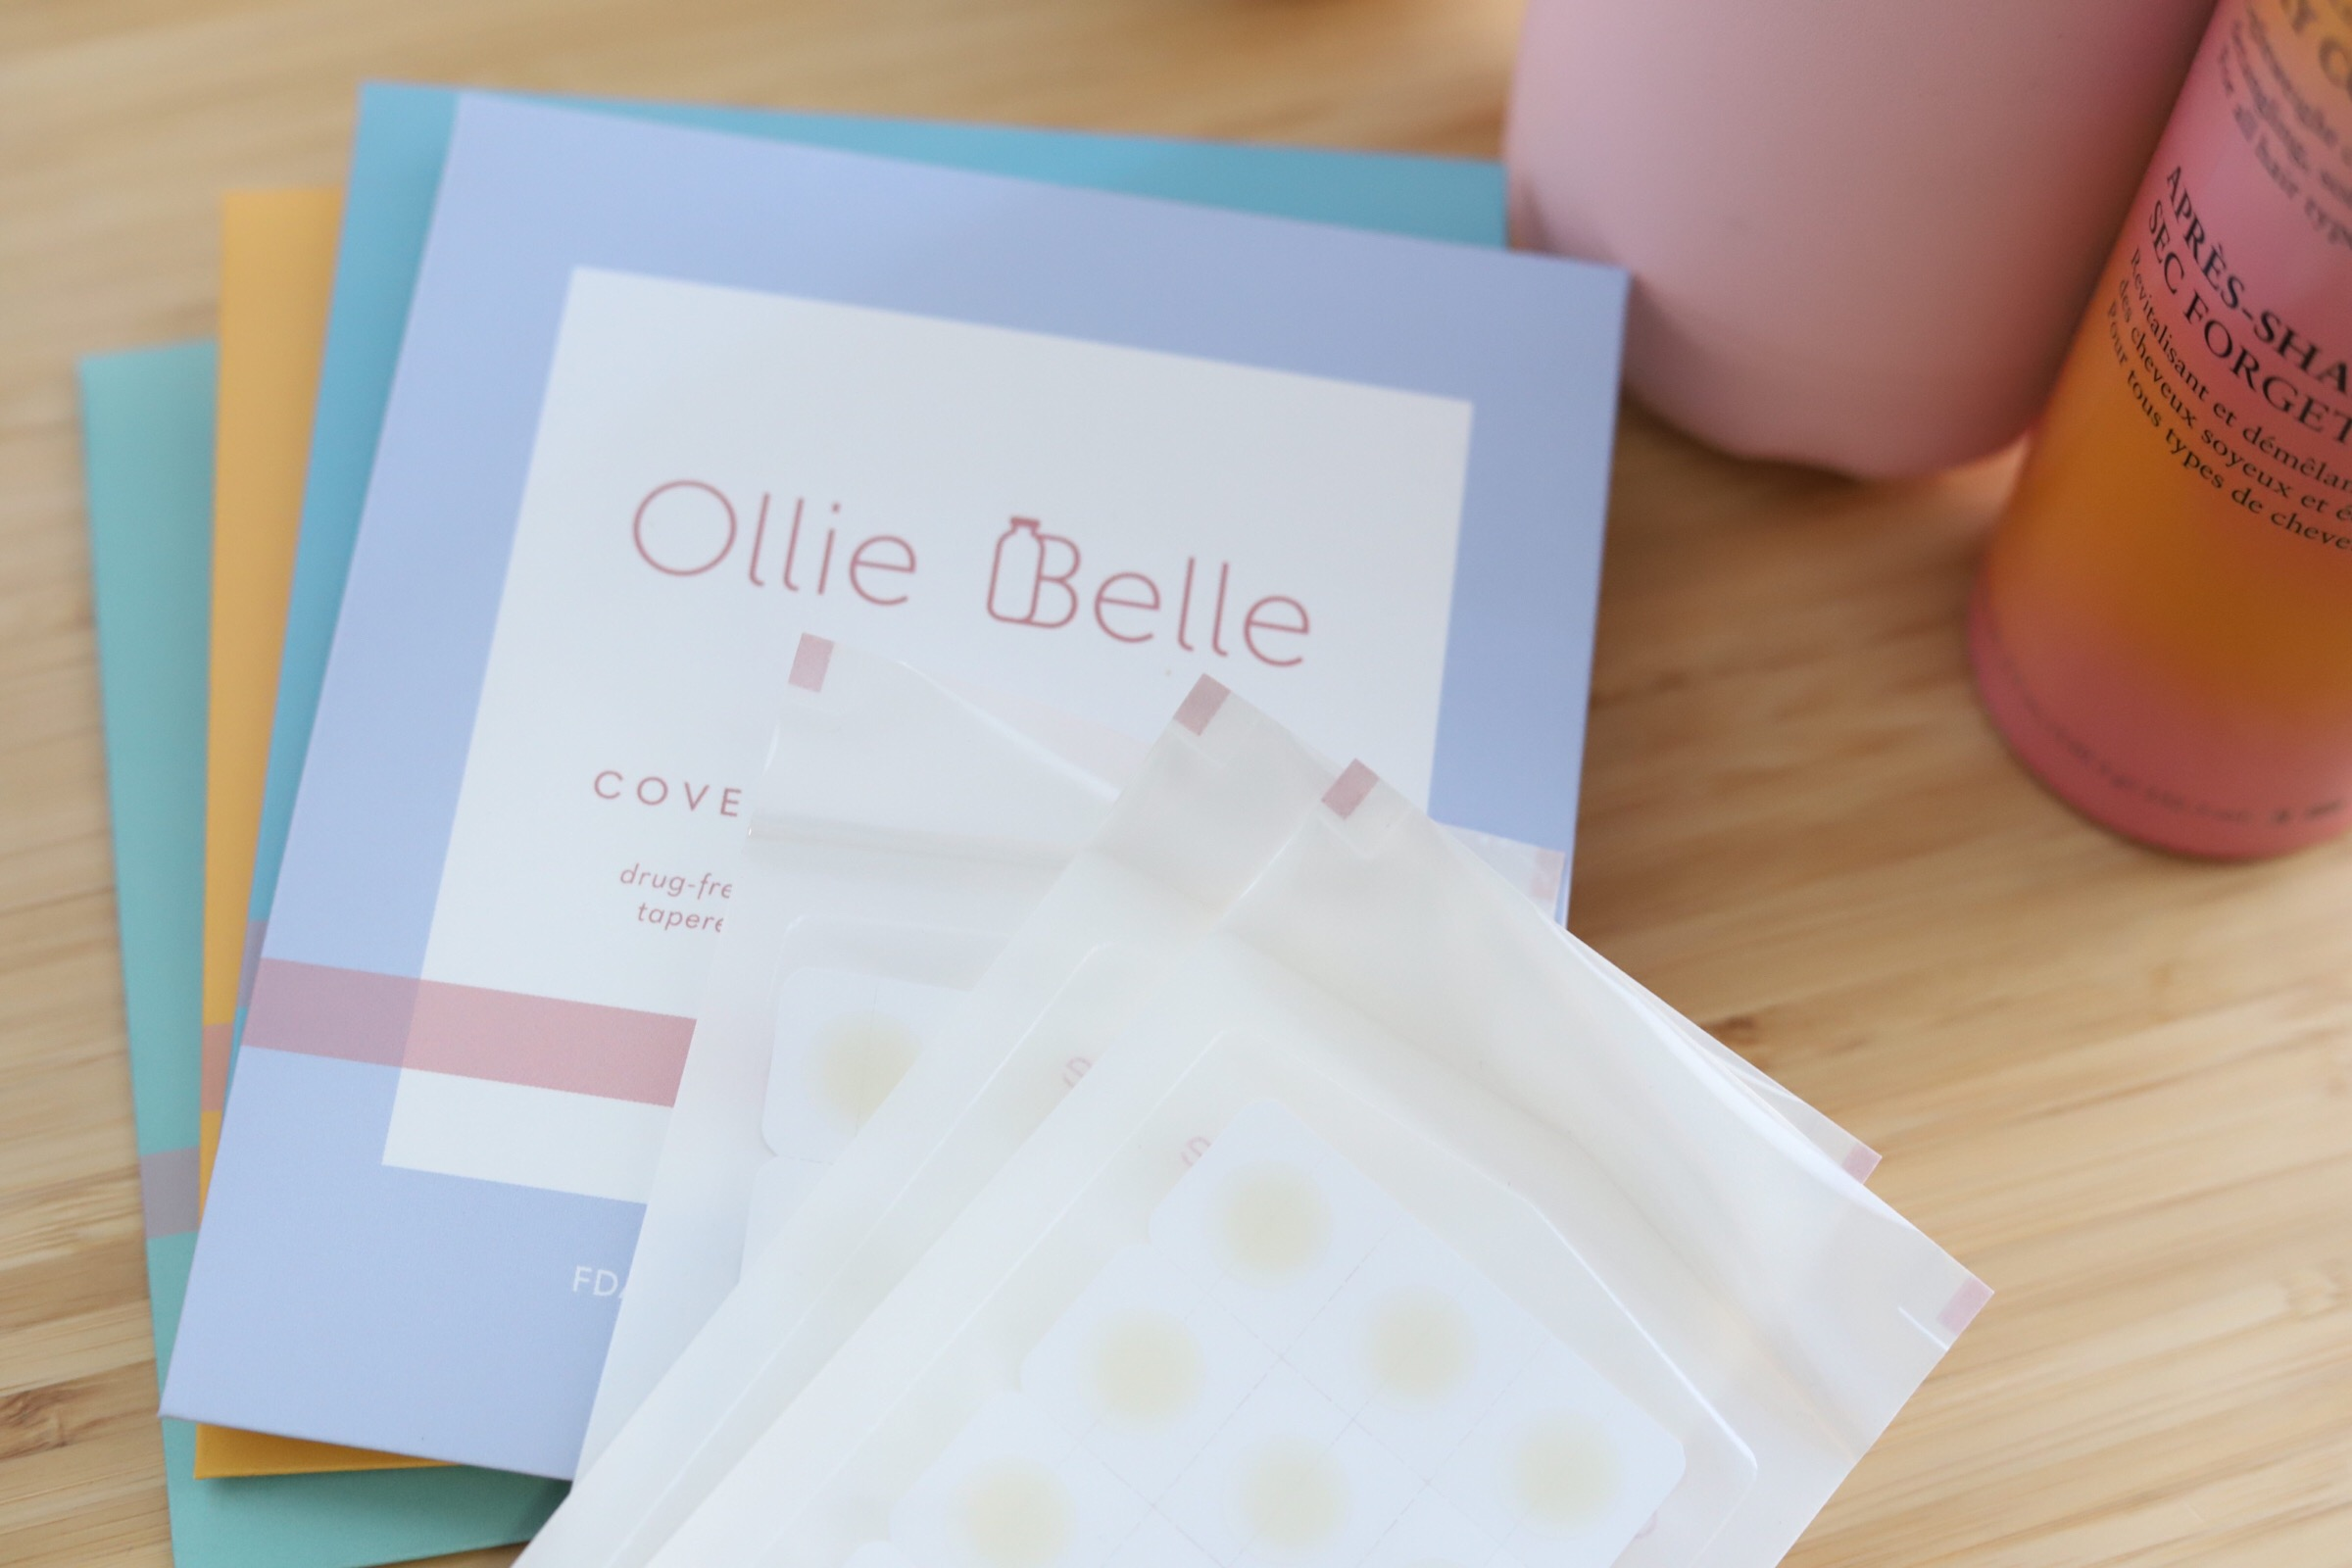 3. Ollie Belle - $21 + 25% off